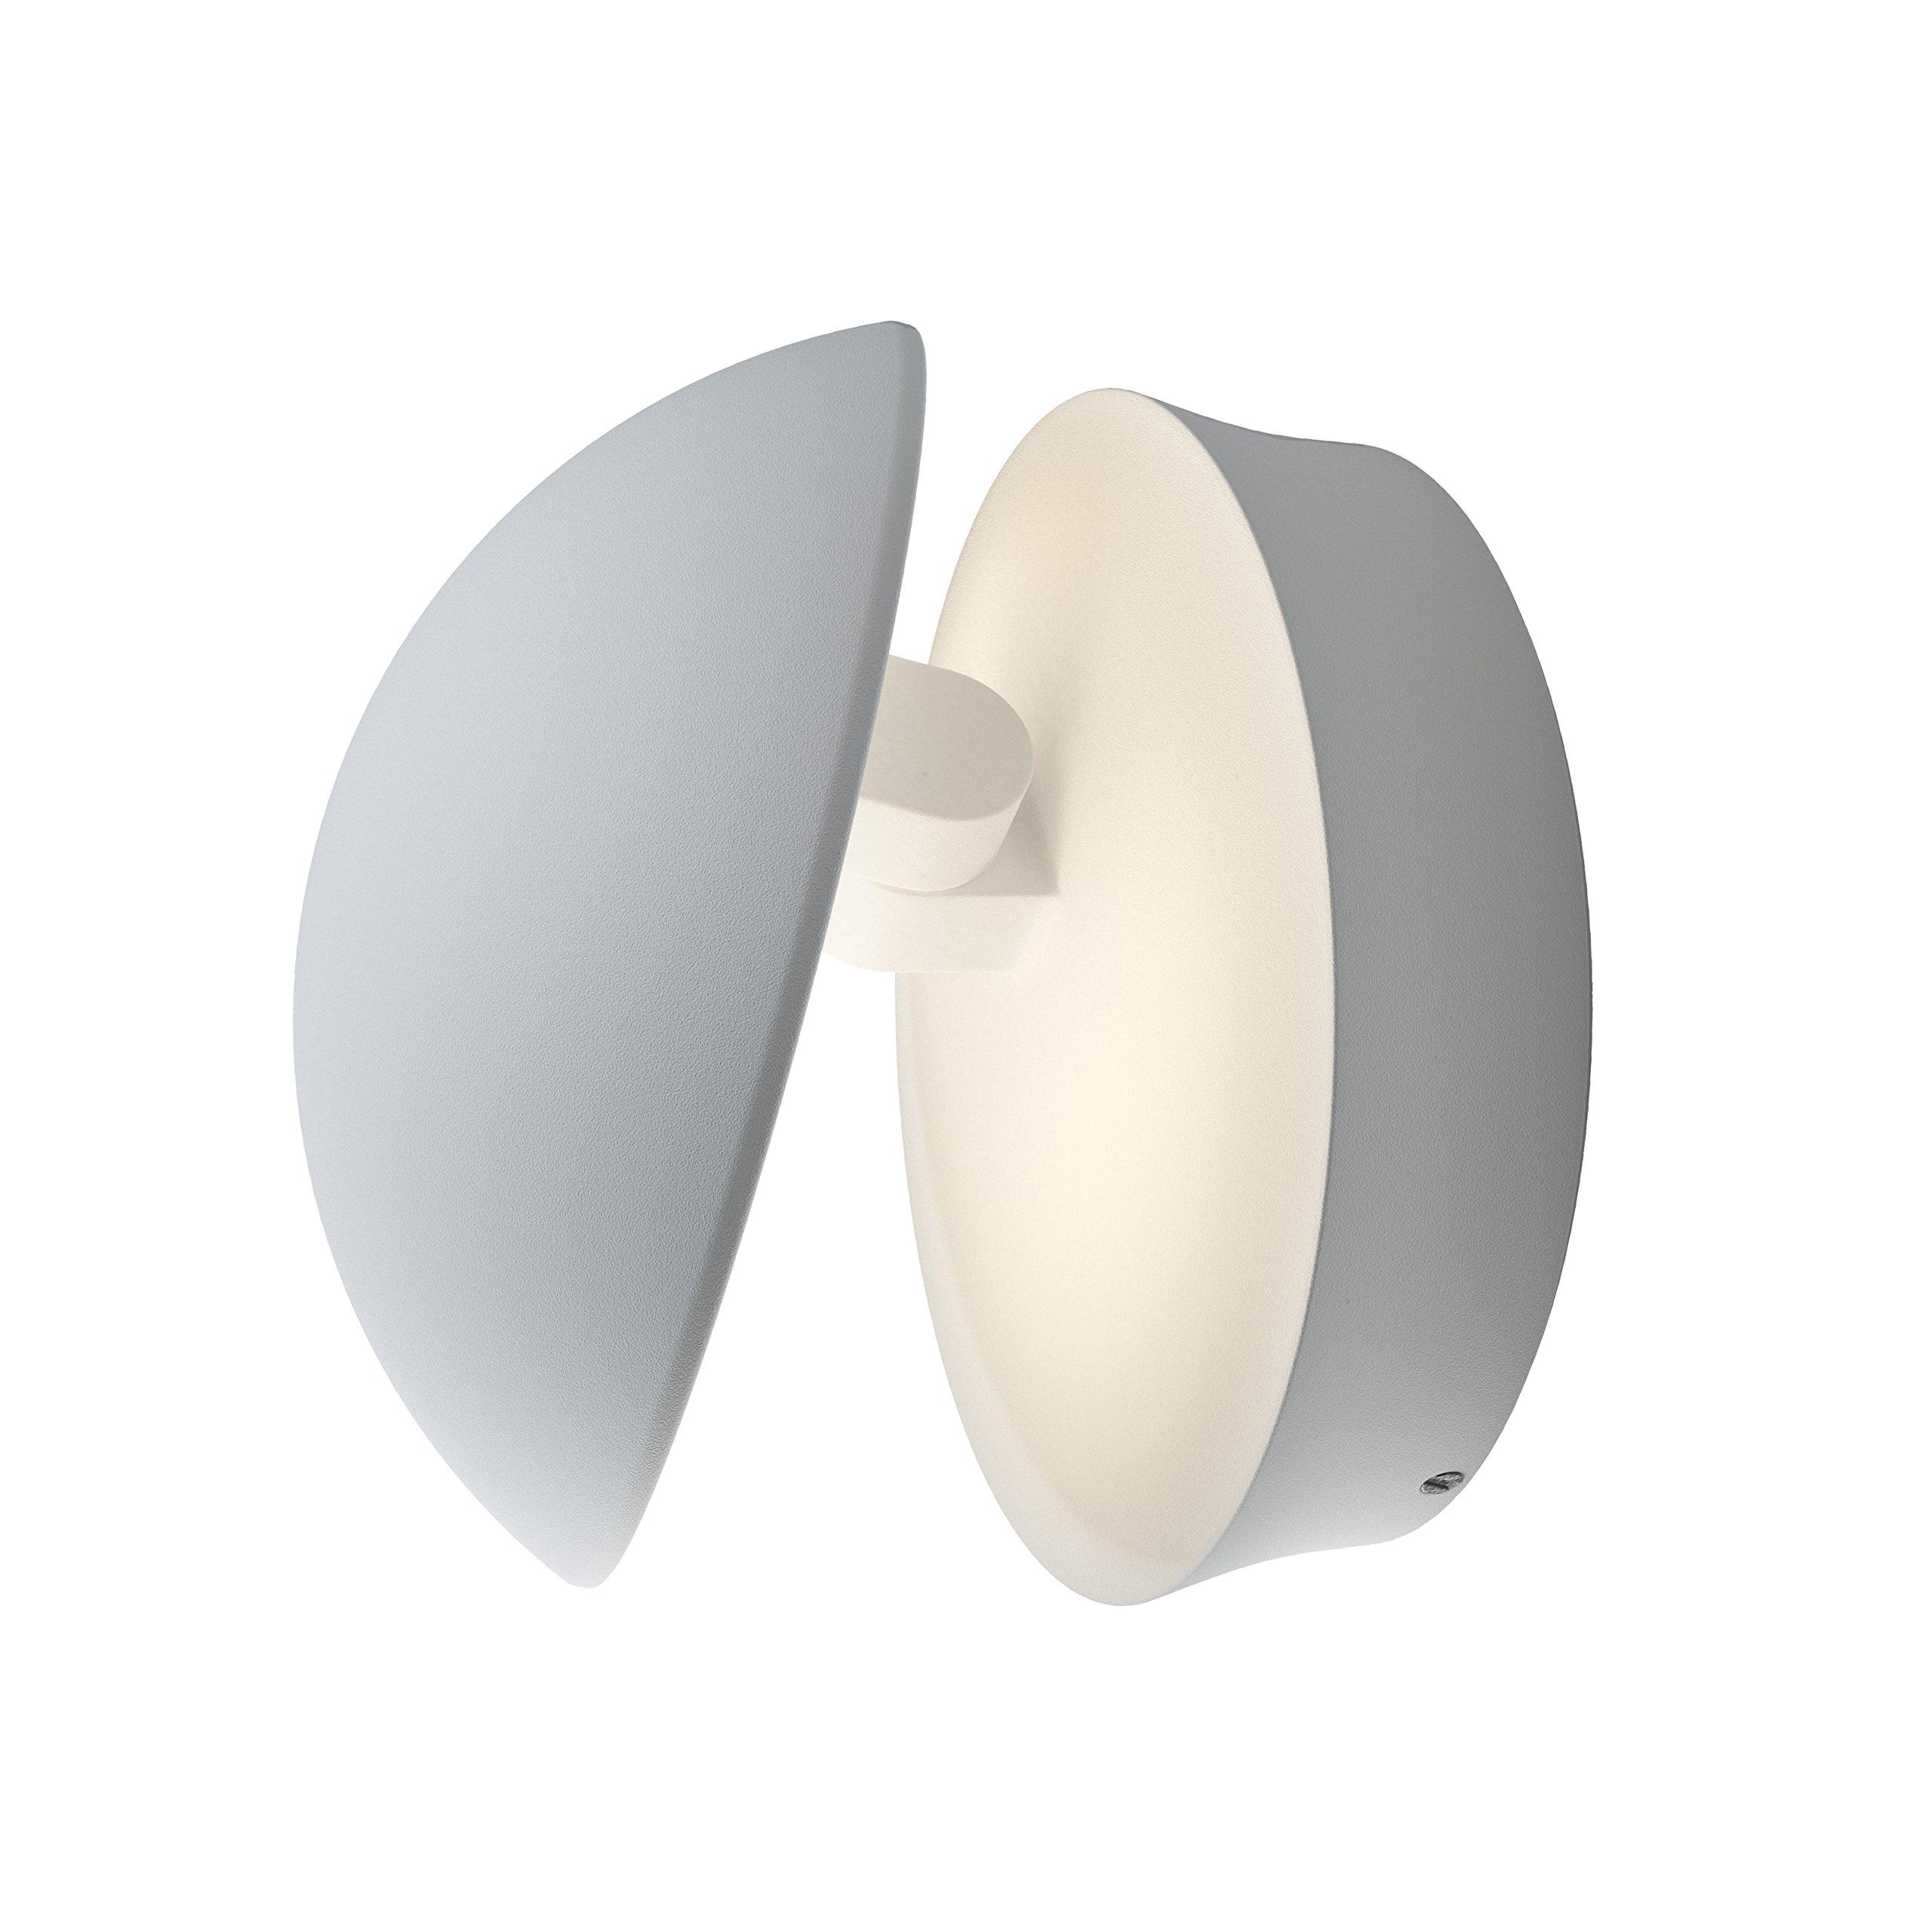 Osram Endura 风格 简约创意 覆盖式 RD LED户外灯具,暖白色,13瓦